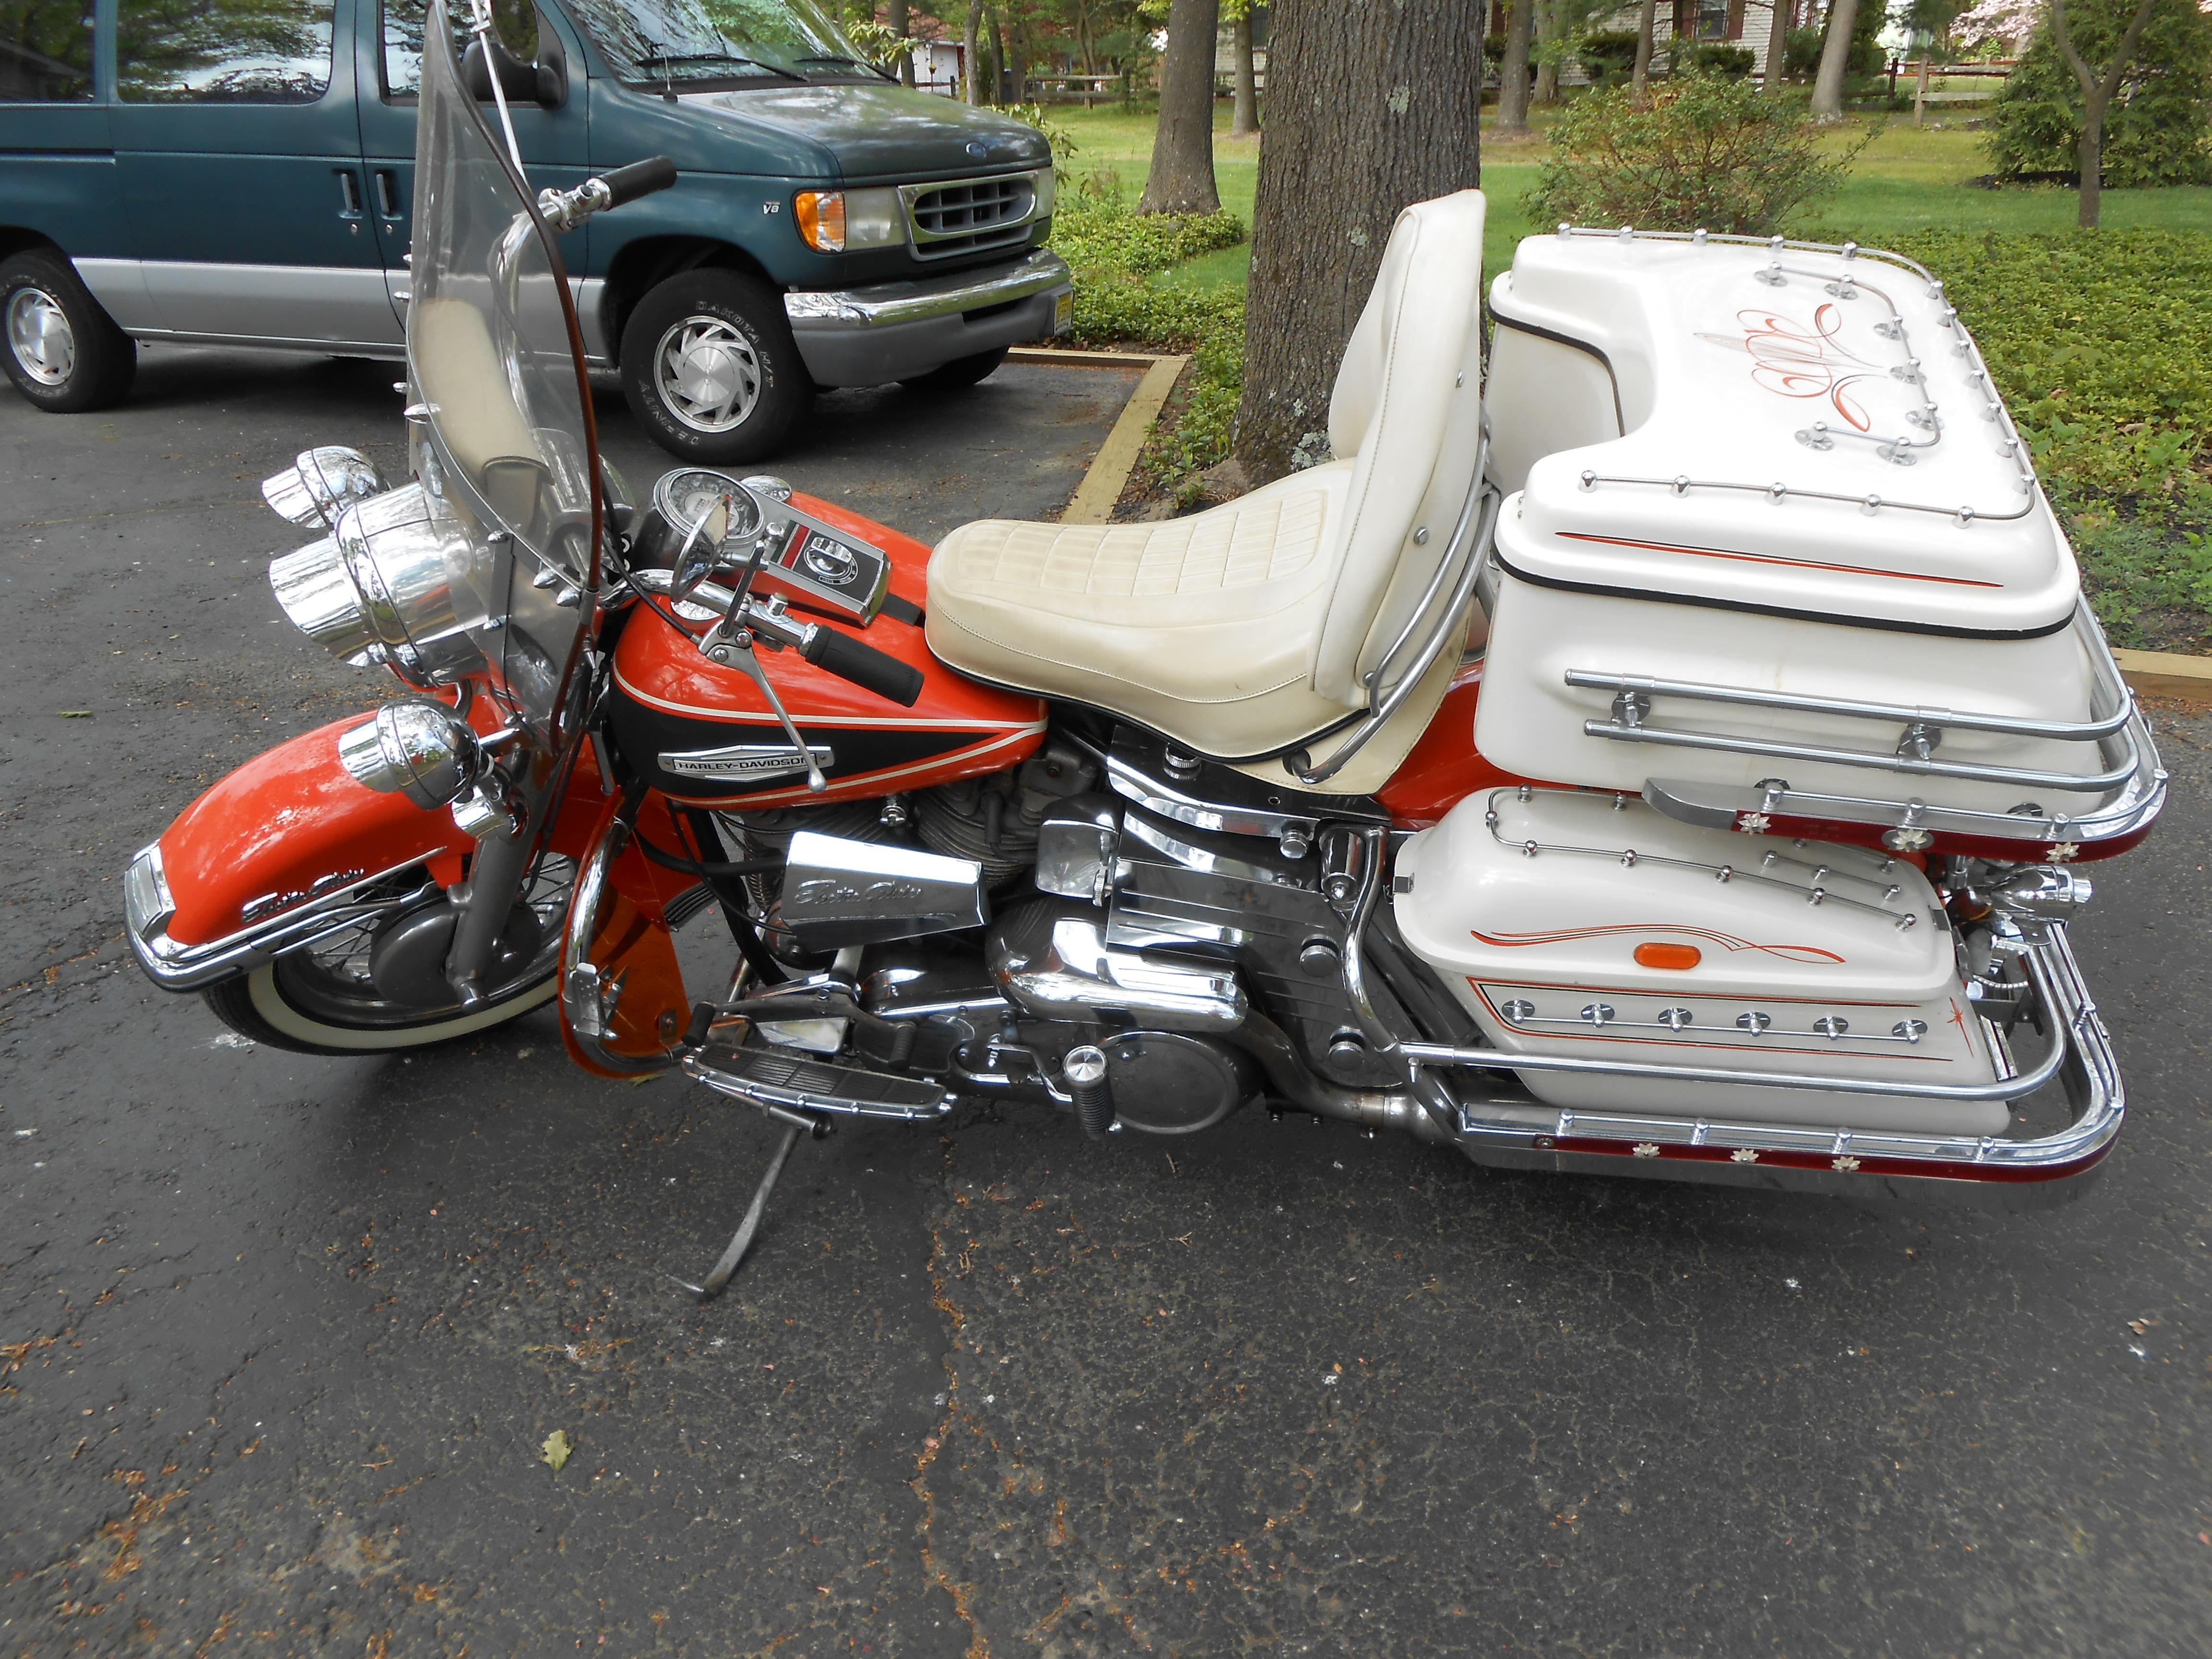 1968 Harley Davidson Dresser Clic Jpg Wallpaper 4608x3456 165107 Wallpaperup